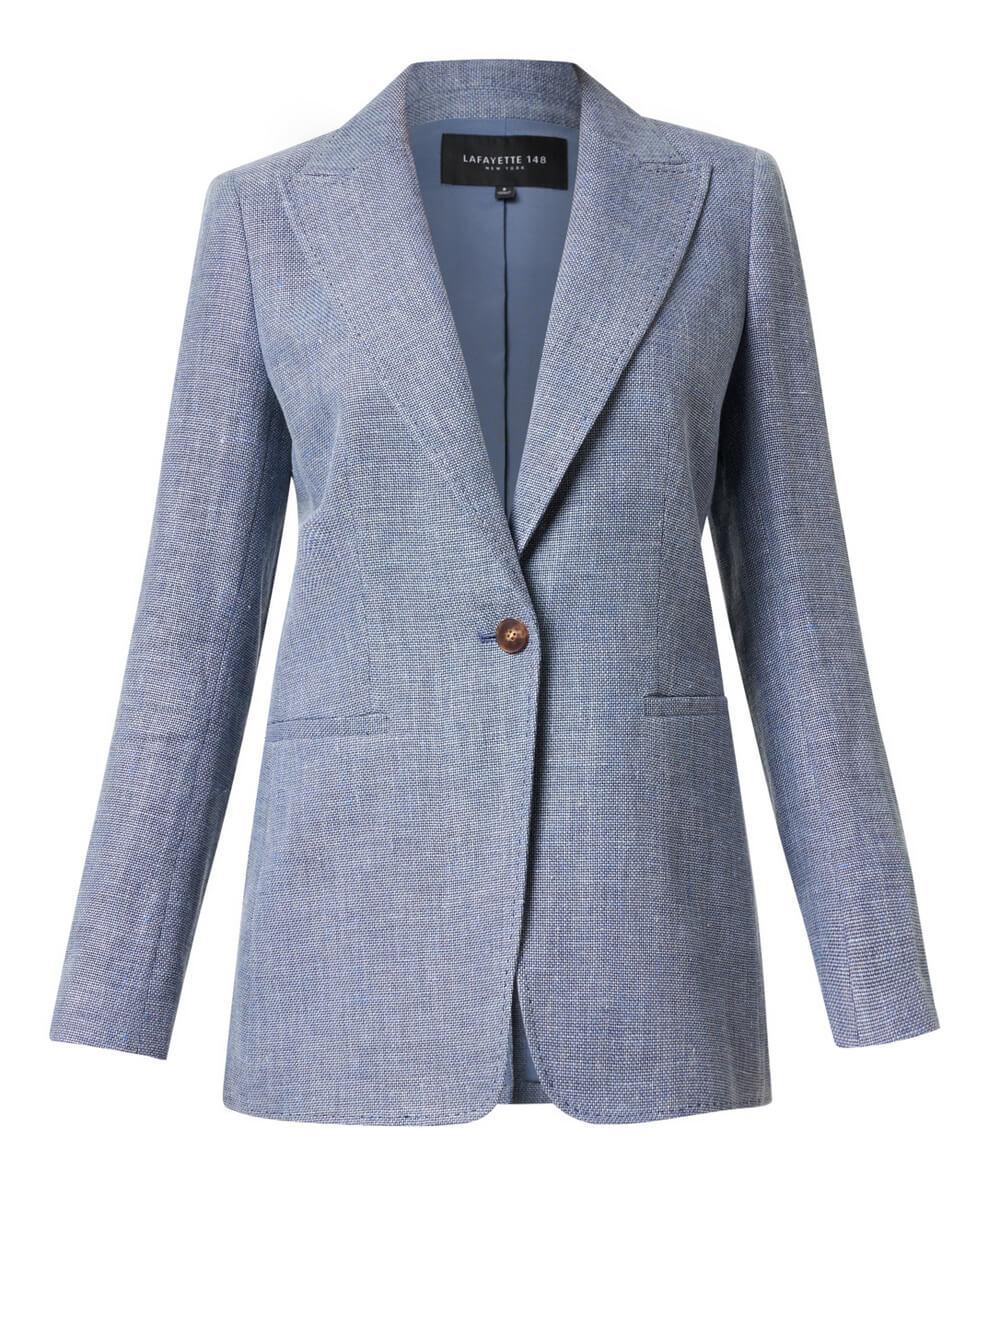 Hurley Isola Weave Blazer Item # MJCF5H-1K56